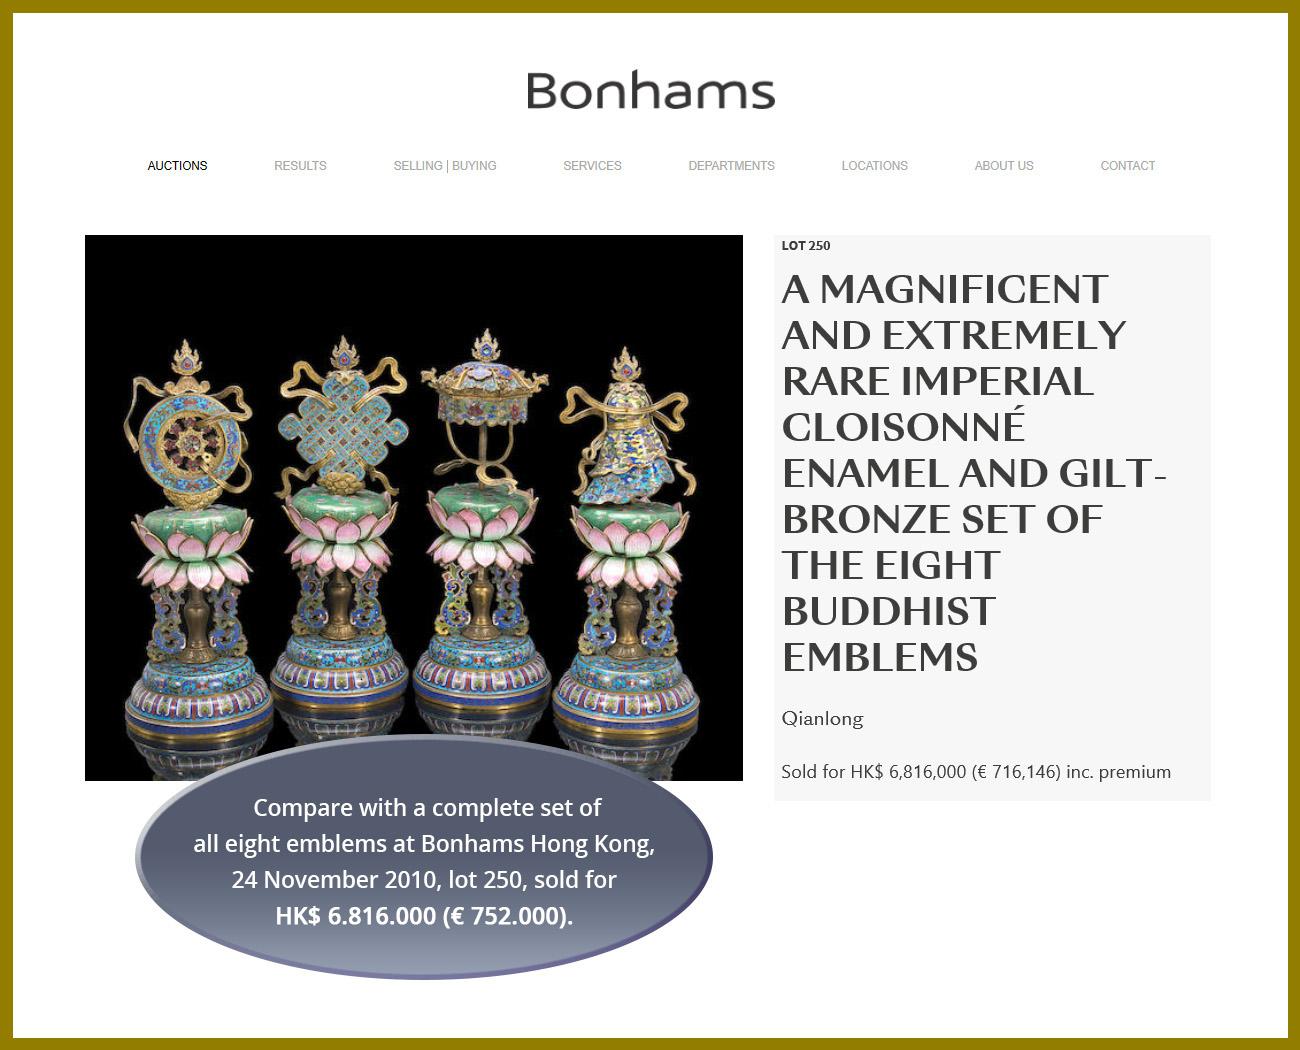 TWO BUDDHIST EMBLEMS, CLOISONNE ENAMEL AND GILT-BRONZE, QIANLONG PERIOD - Image 11 of 12